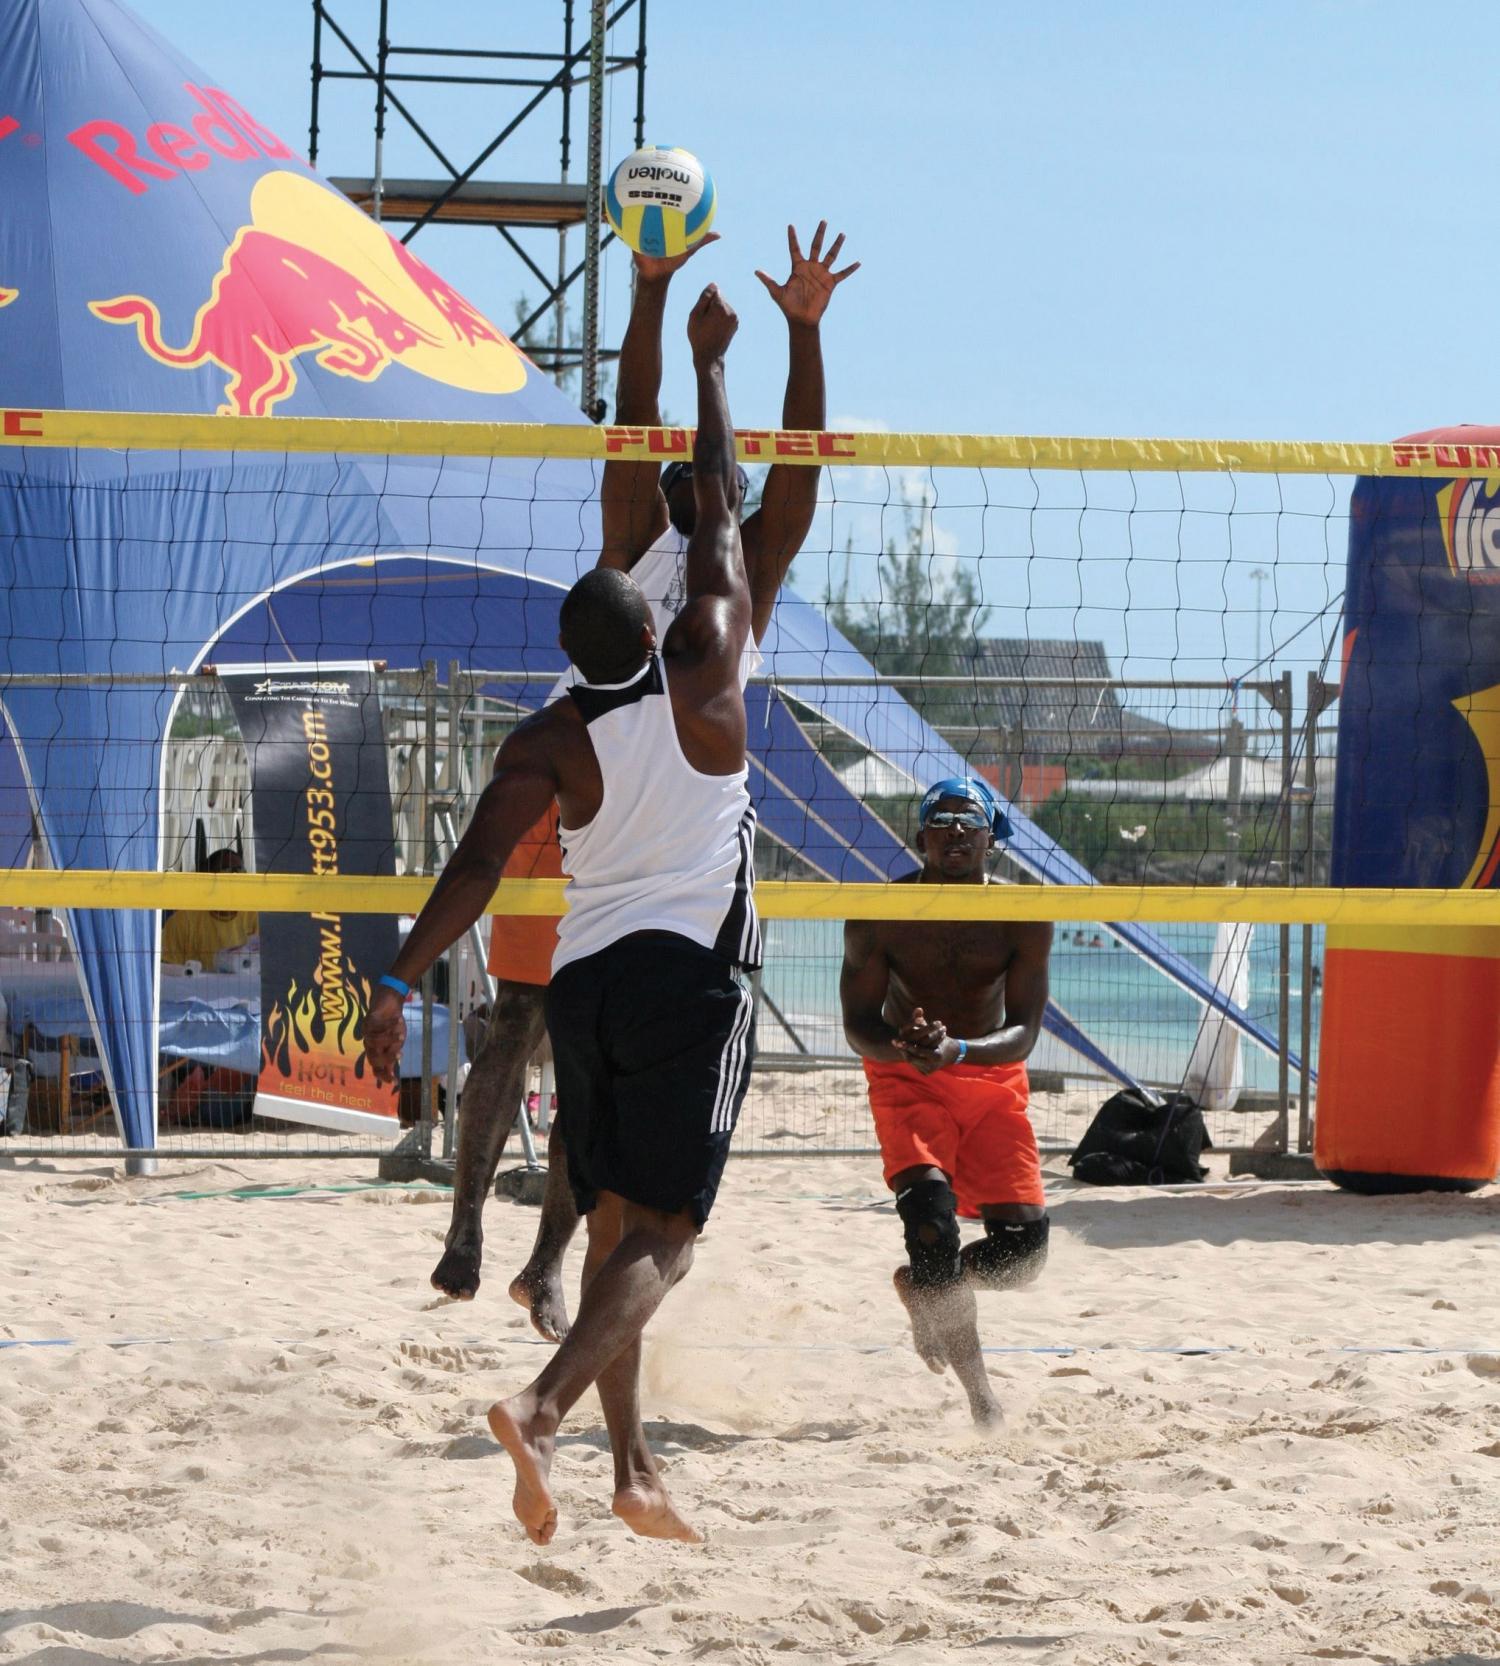 Annual Sizzlin' Sand Beach Volleyball 'Barbados Sunsplash' 2019